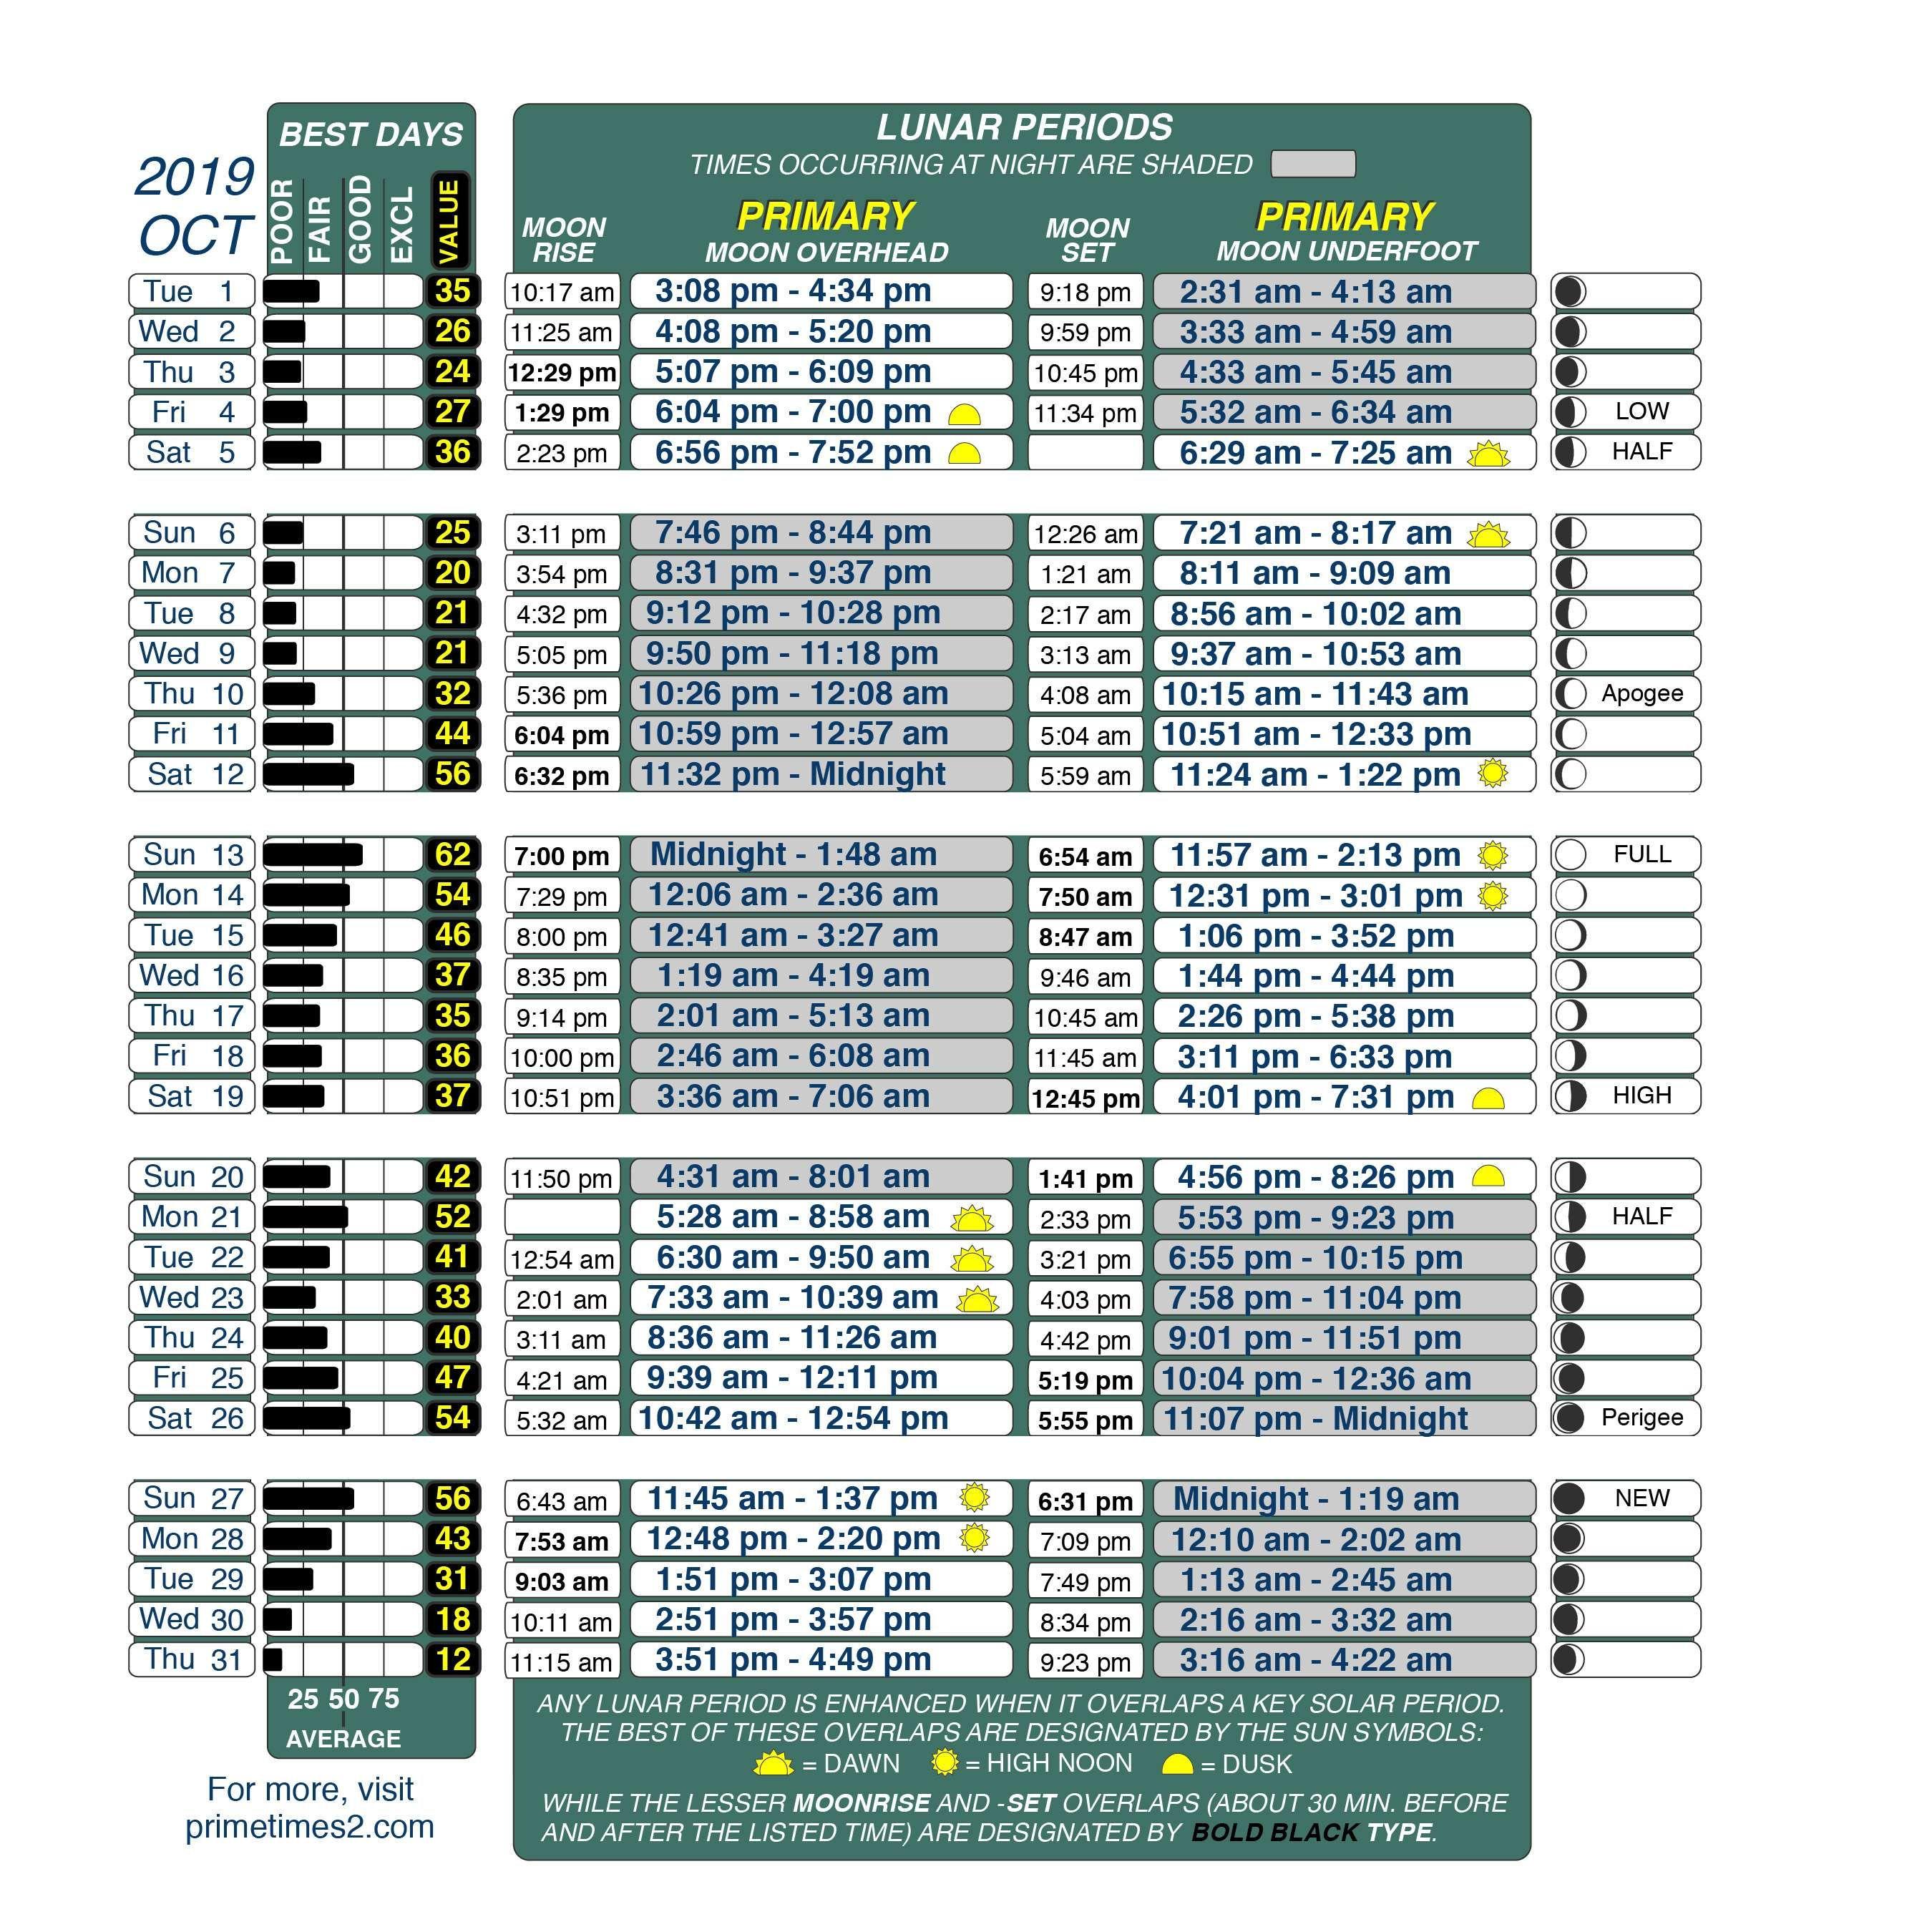 Lunar Fishing Calendar 2022.Get Best Fishing Times With Lunar Fishing Calendars Fishing Calendar Best Fishing Times Best Fishing Days